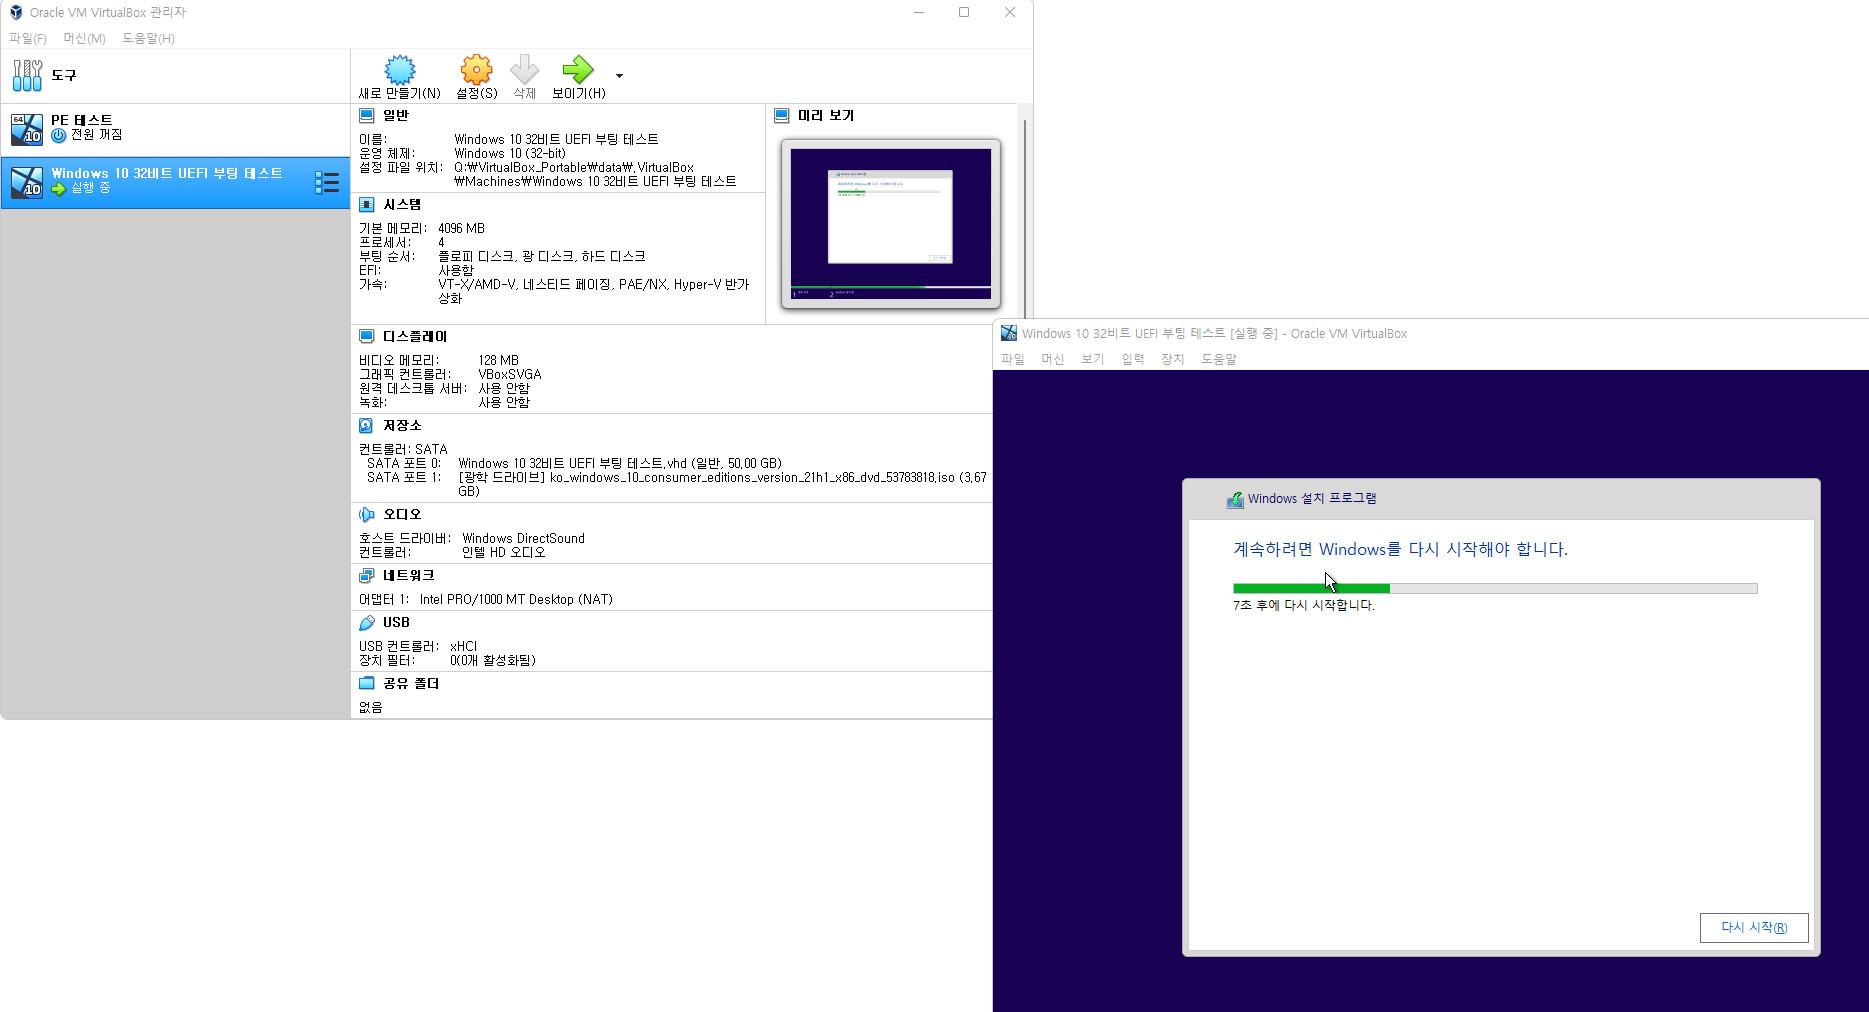 UEFI 부팅은 원래 32비트도 됩니다. 실컴은 메인보드 차원에서 32비트는 제한이 된 것 뿐입니다 - 가상머신에서는 32비트도 UEFI 됩니다 2021-09-08_143312.jpg